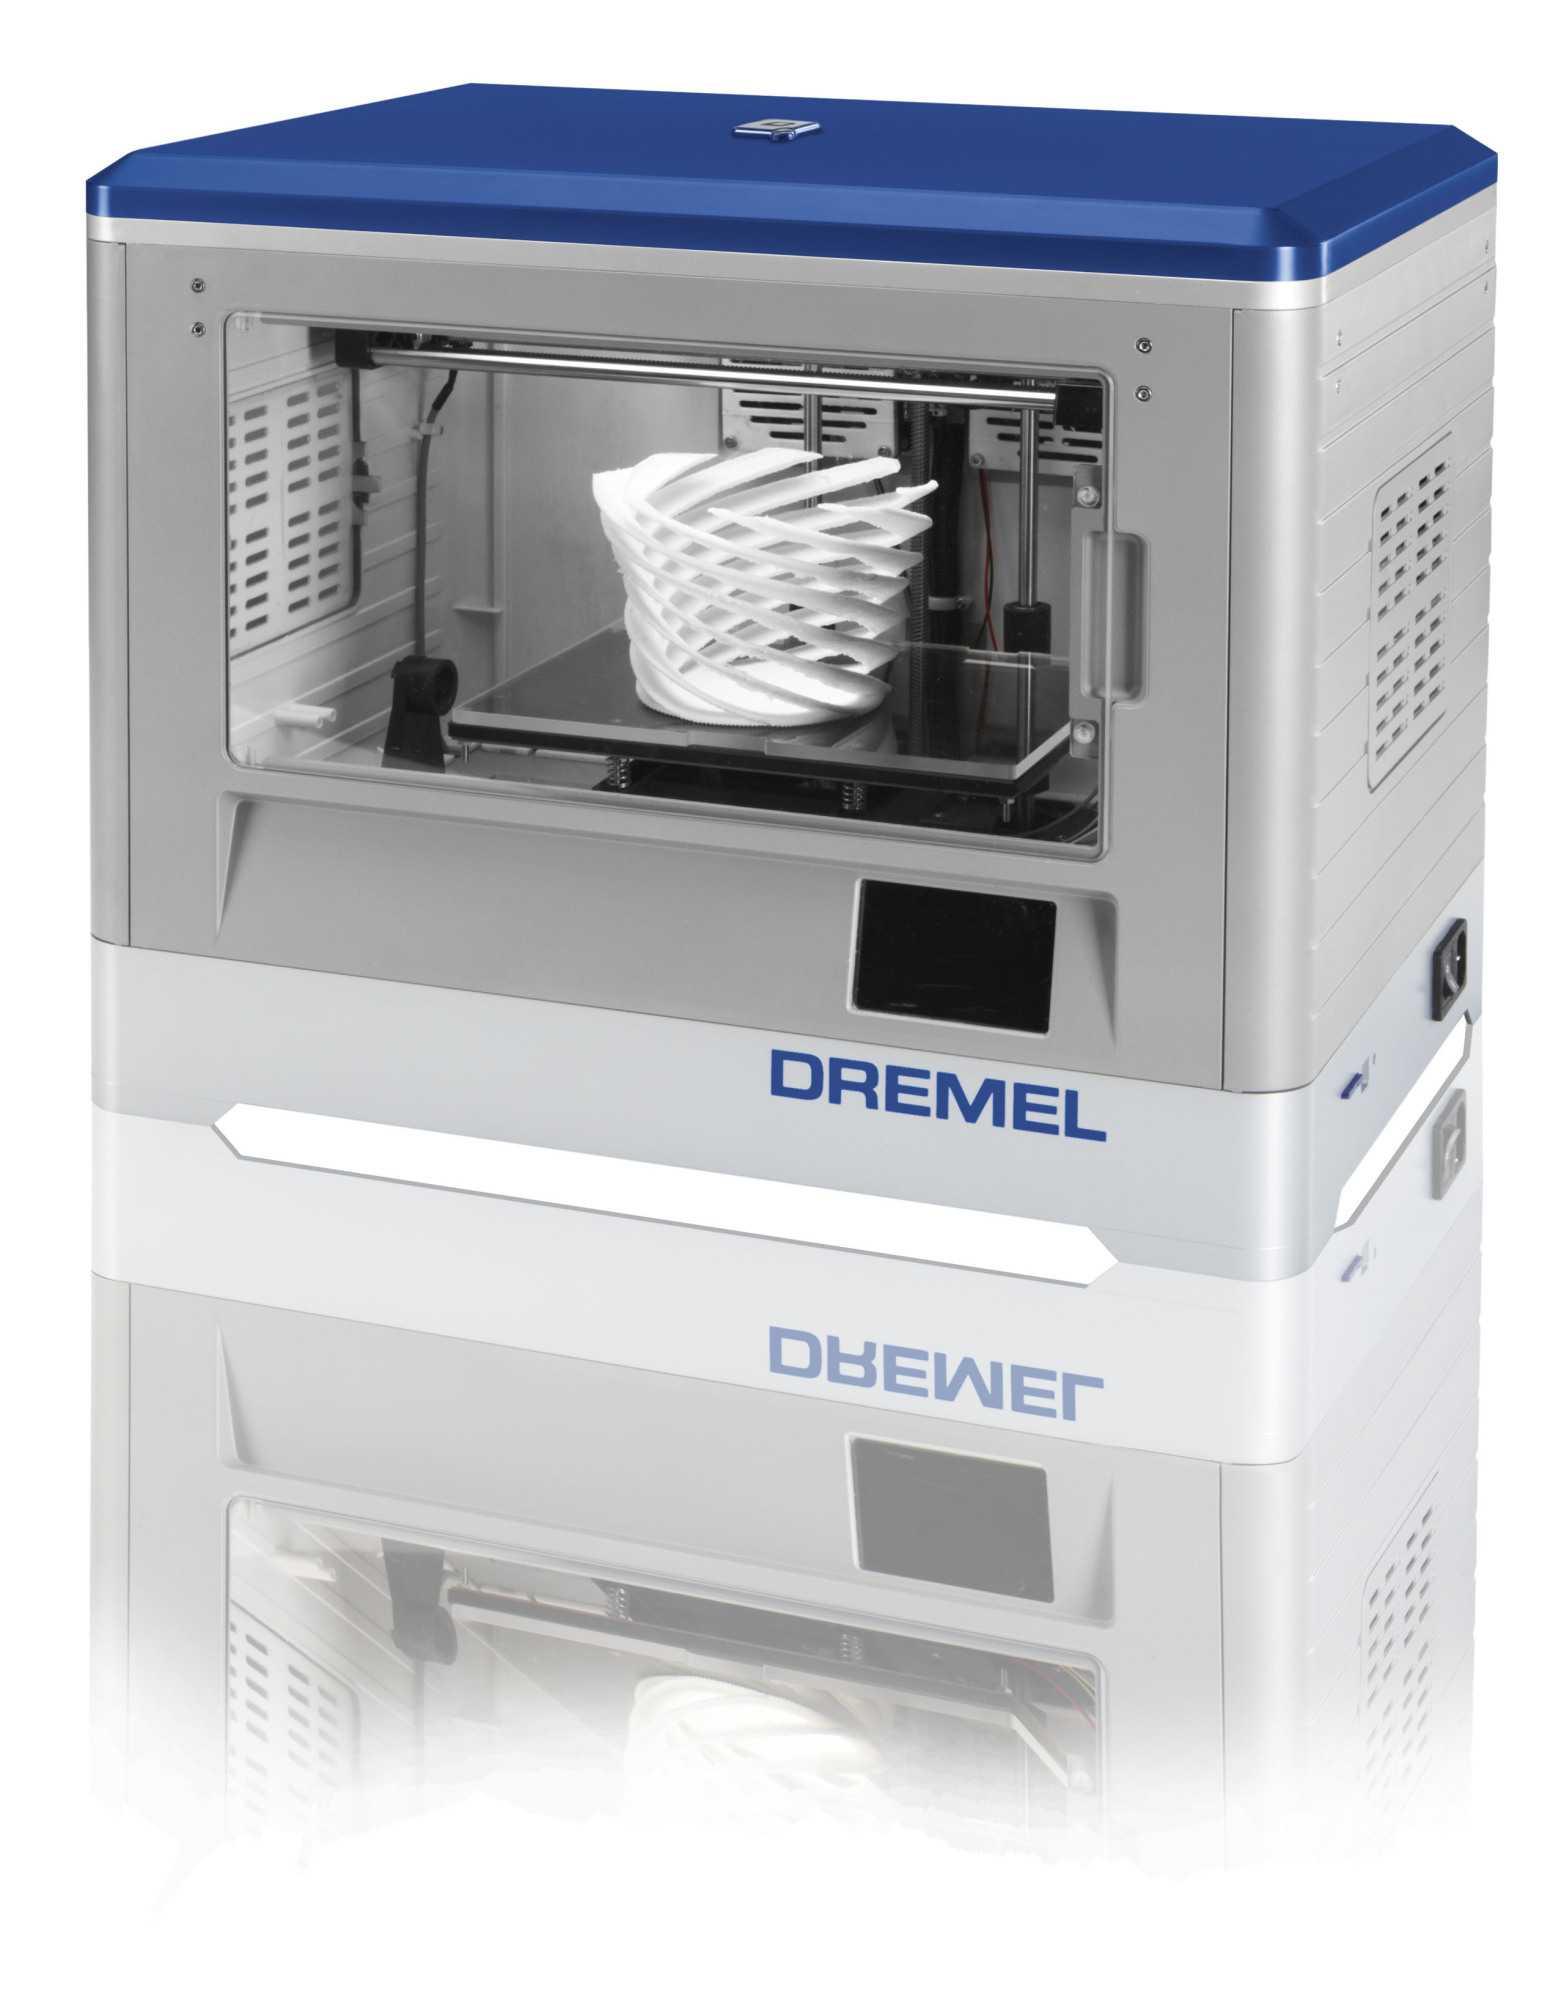 Dremel präsentiert eigenen 3D-Drucker | Make